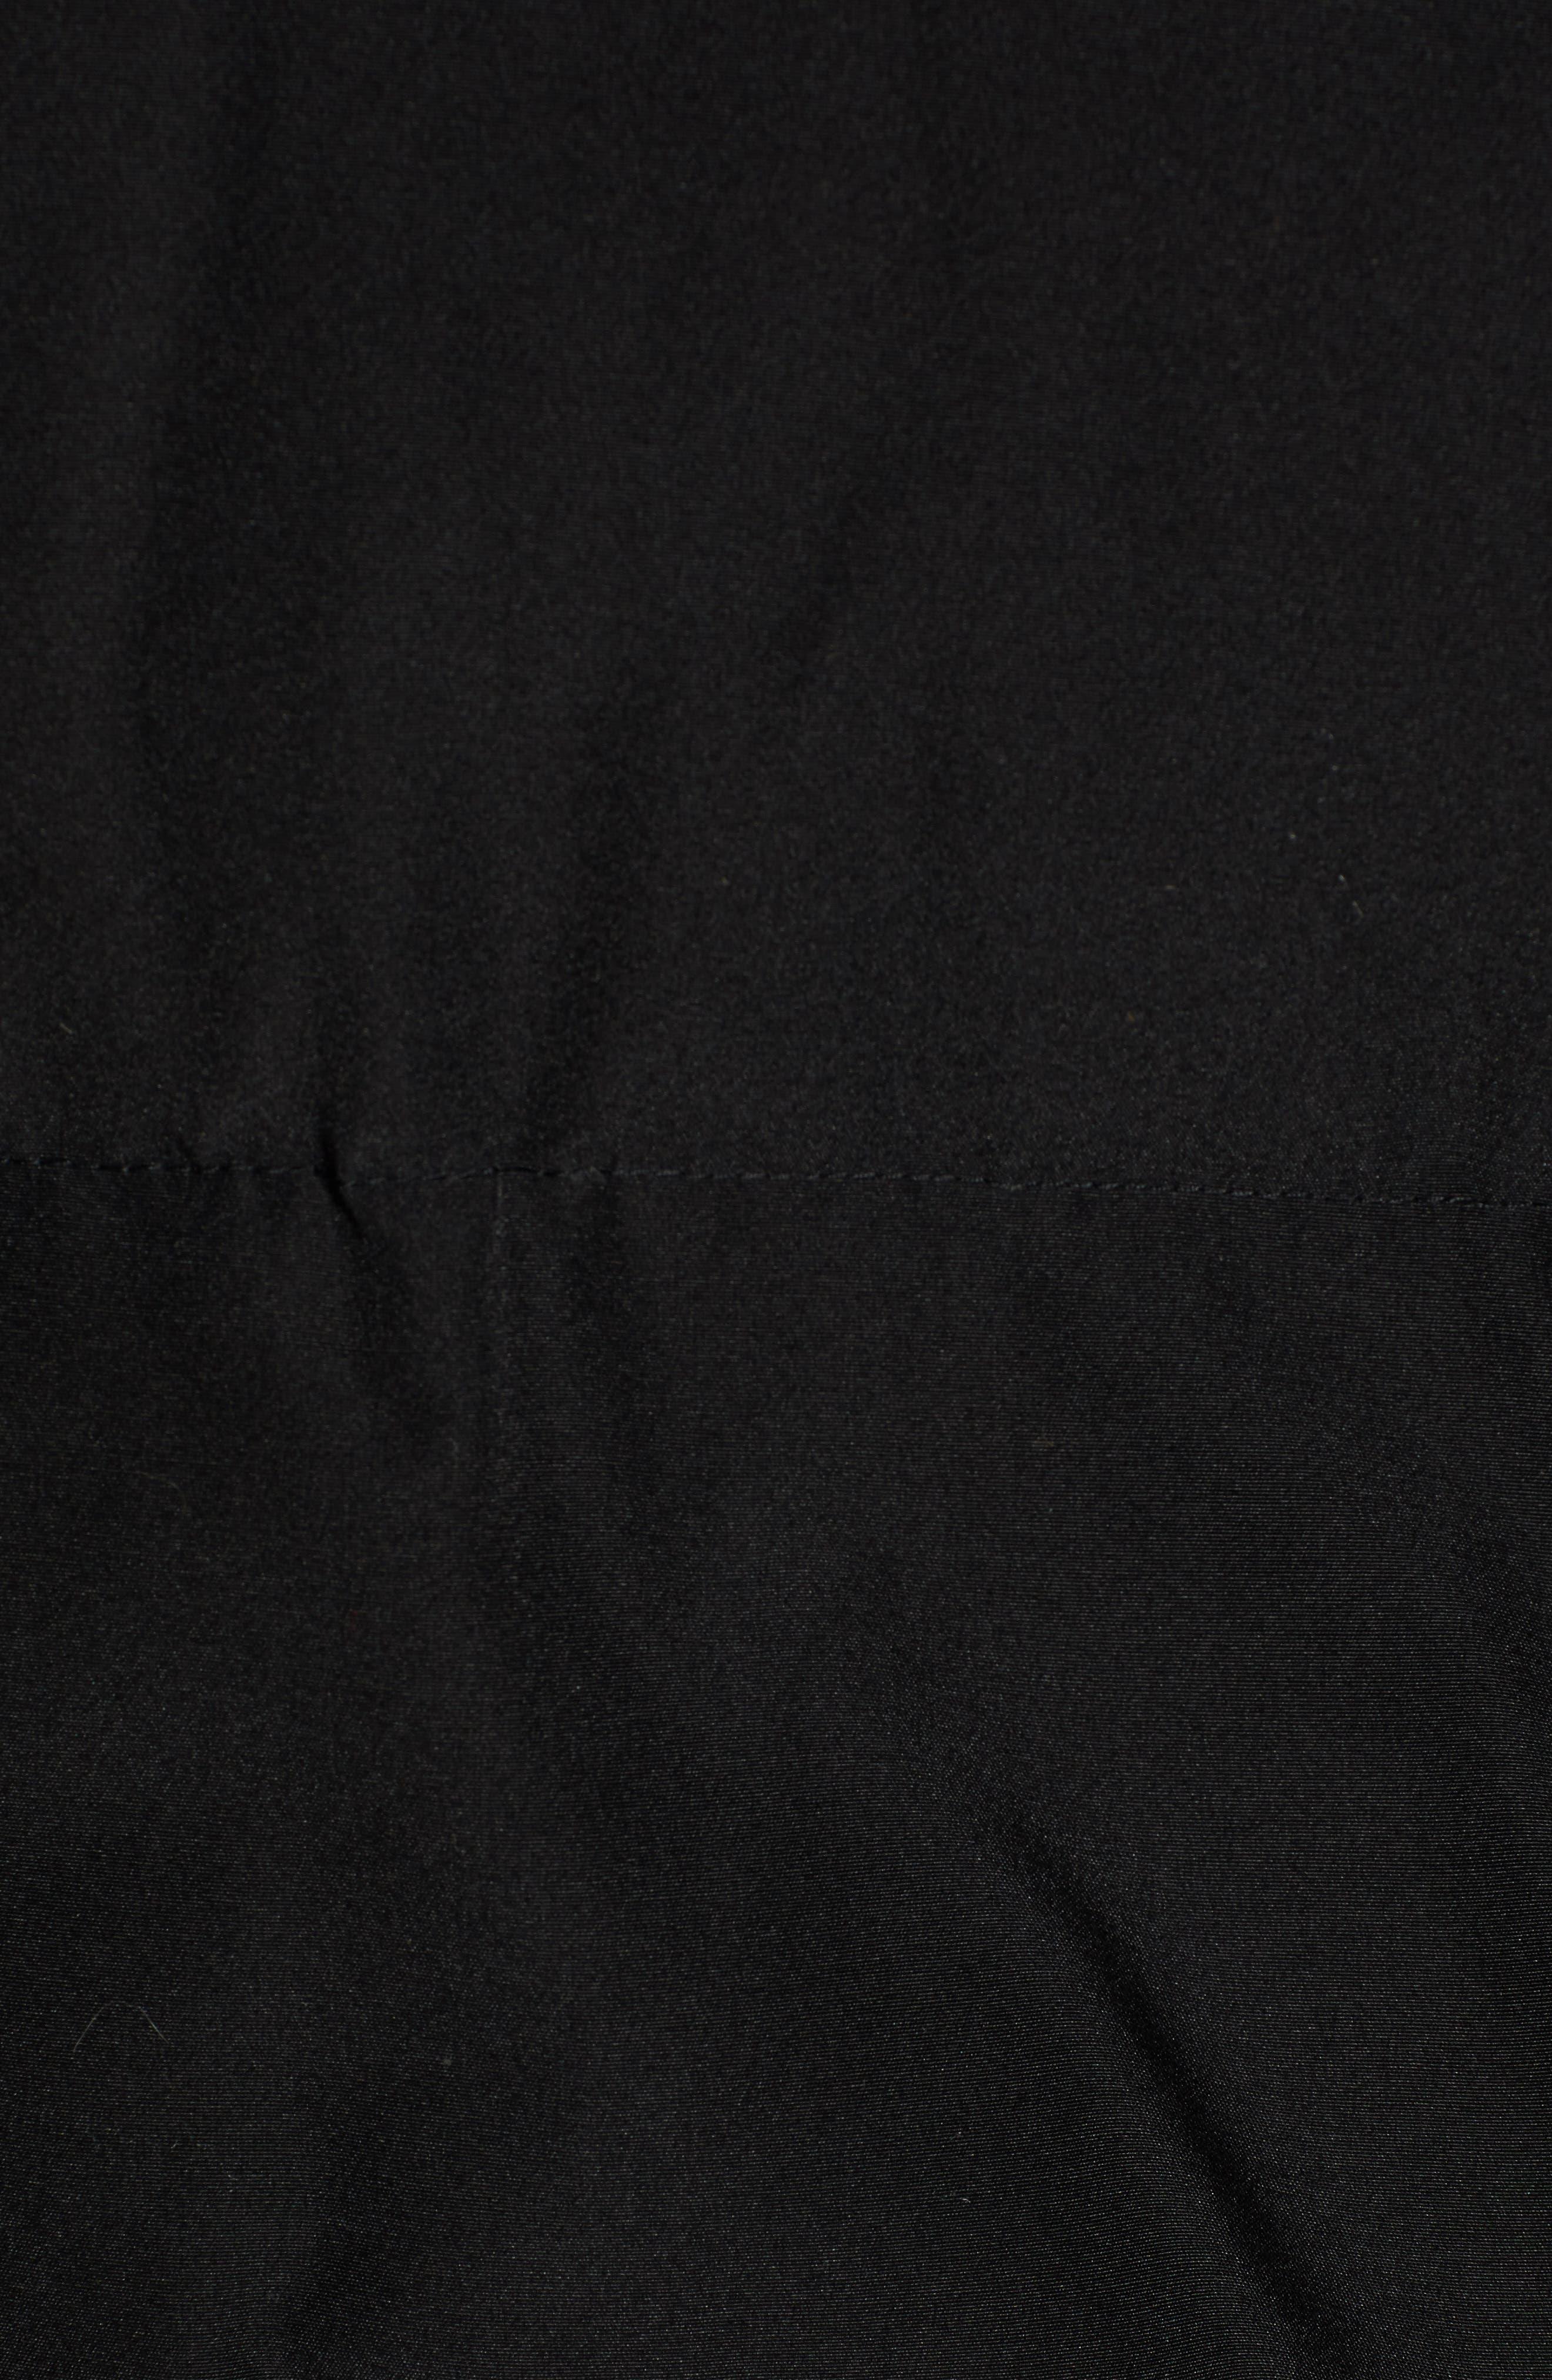 Hooded Puffer Jacket,                             Alternate thumbnail 6, color,                             BLACK